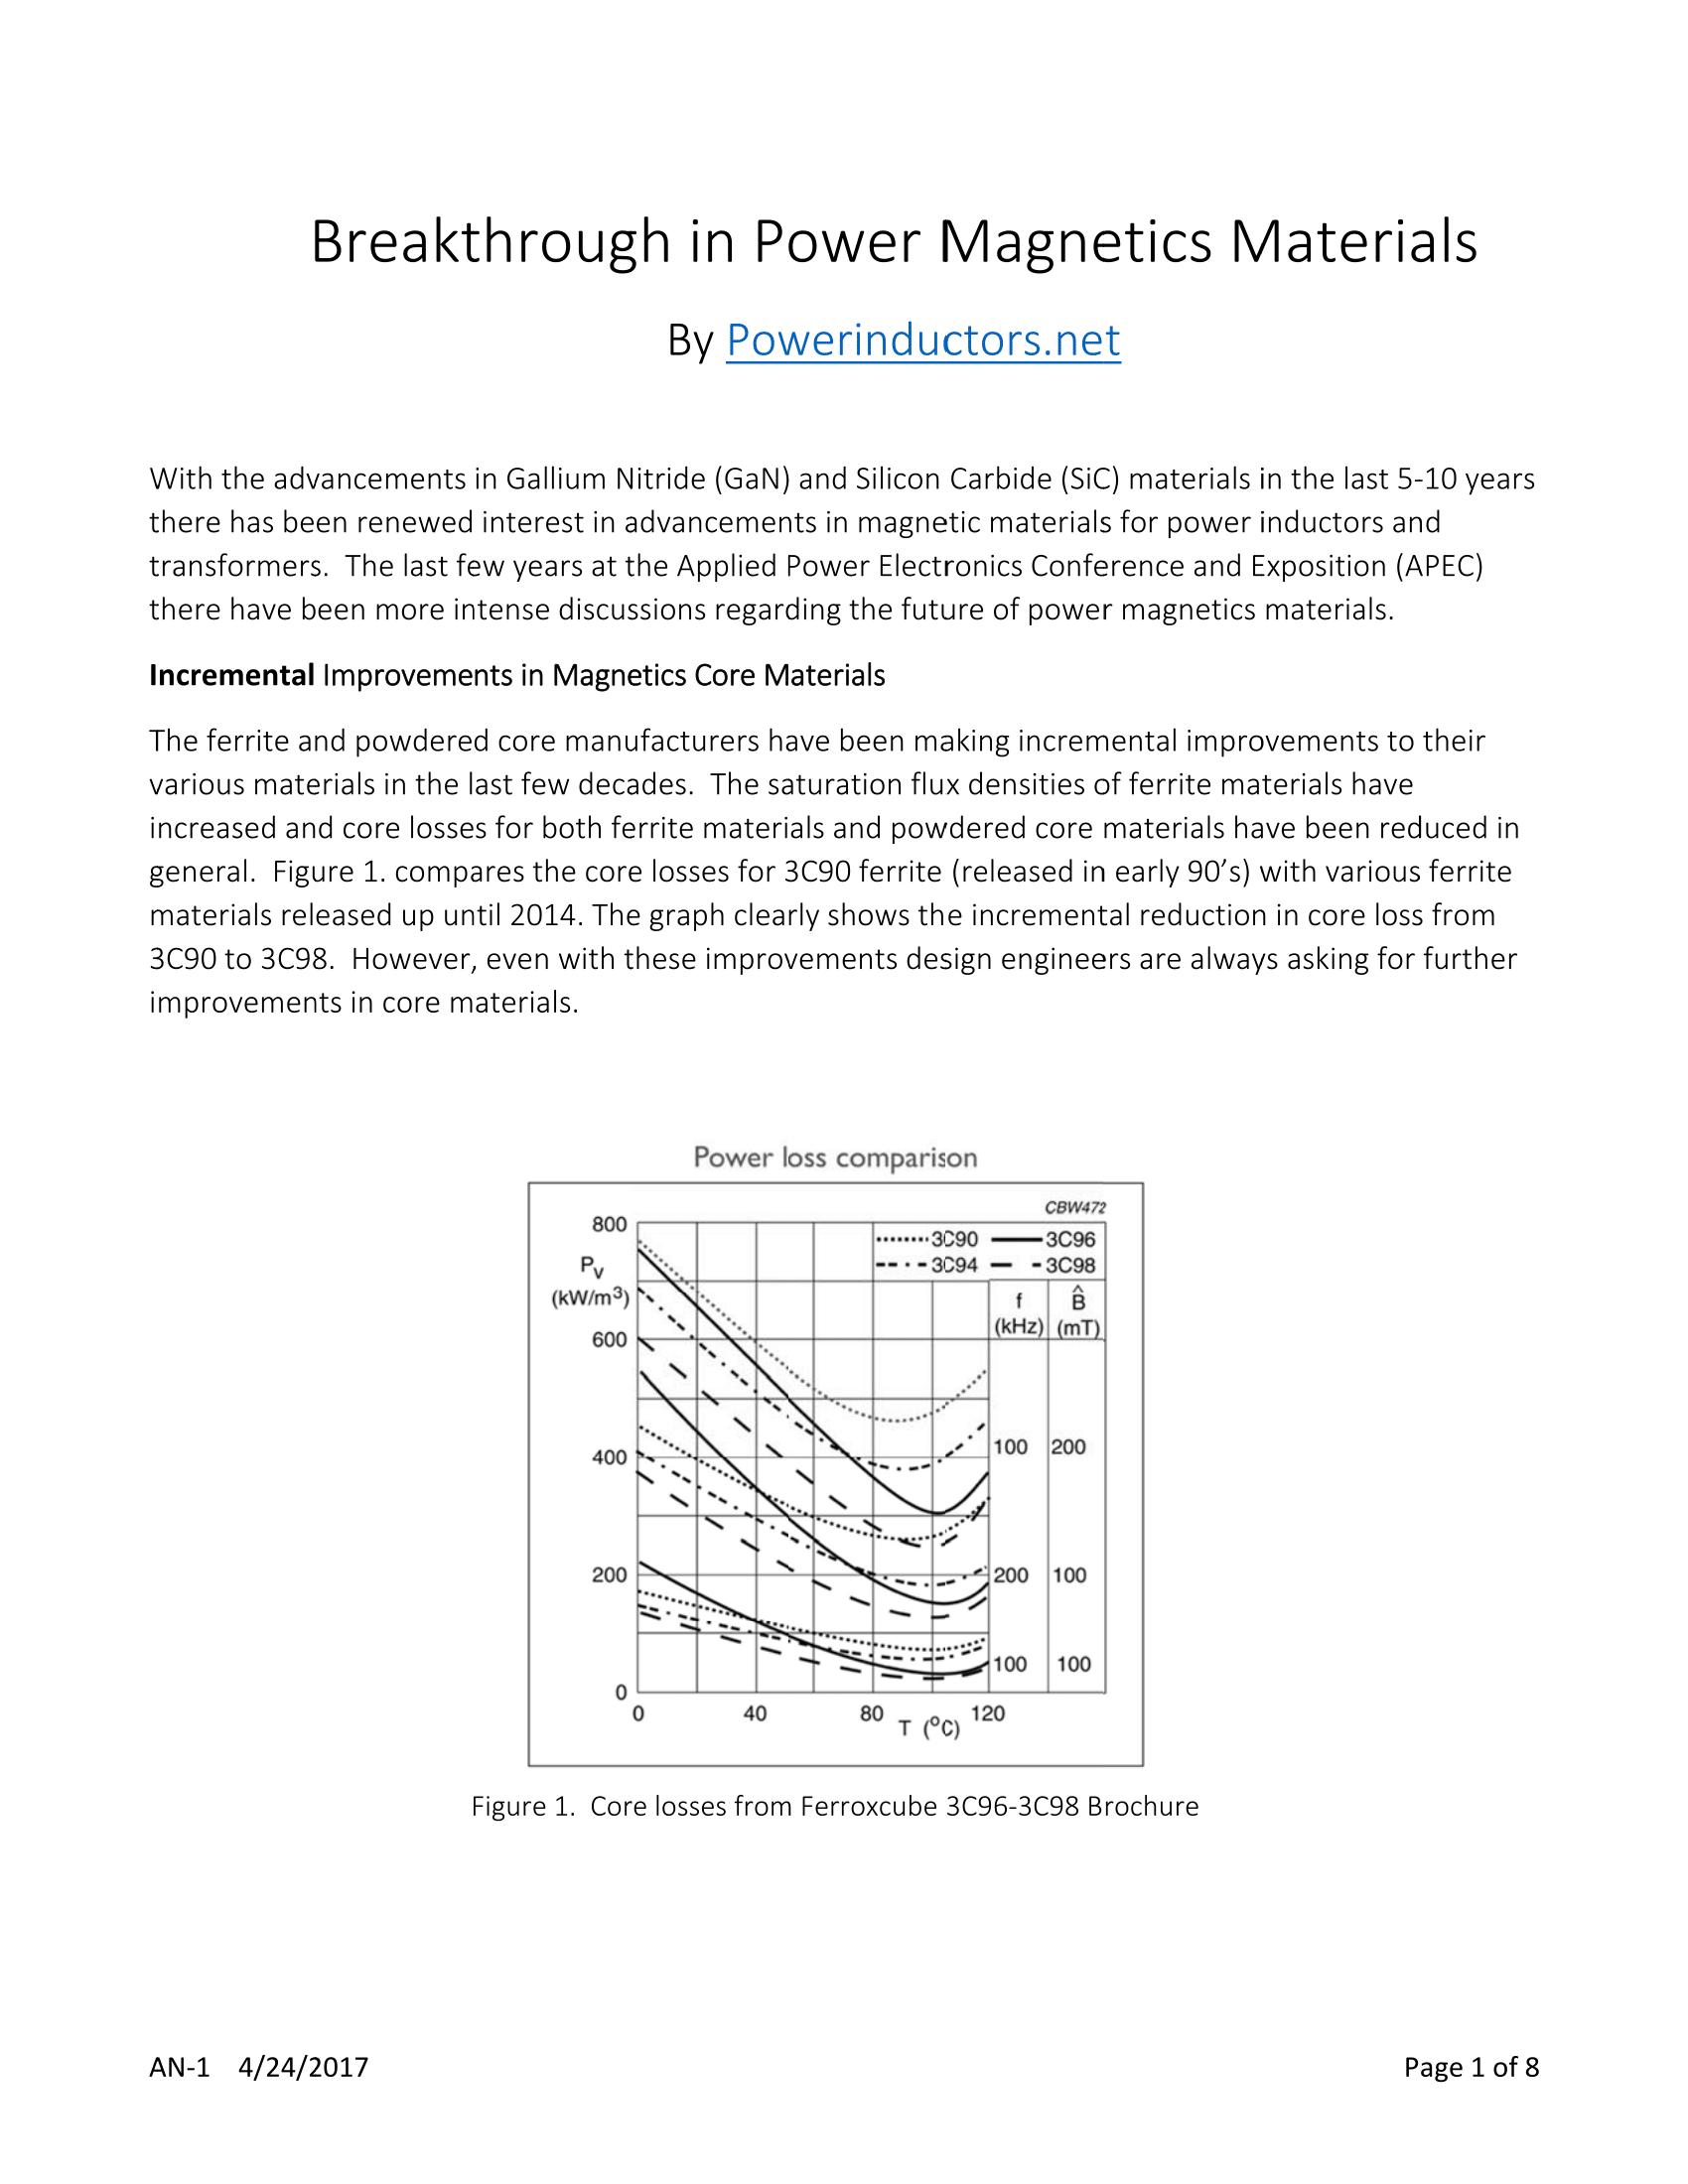 Breakthrough_in_Power_Magnetics_Materials-1.png